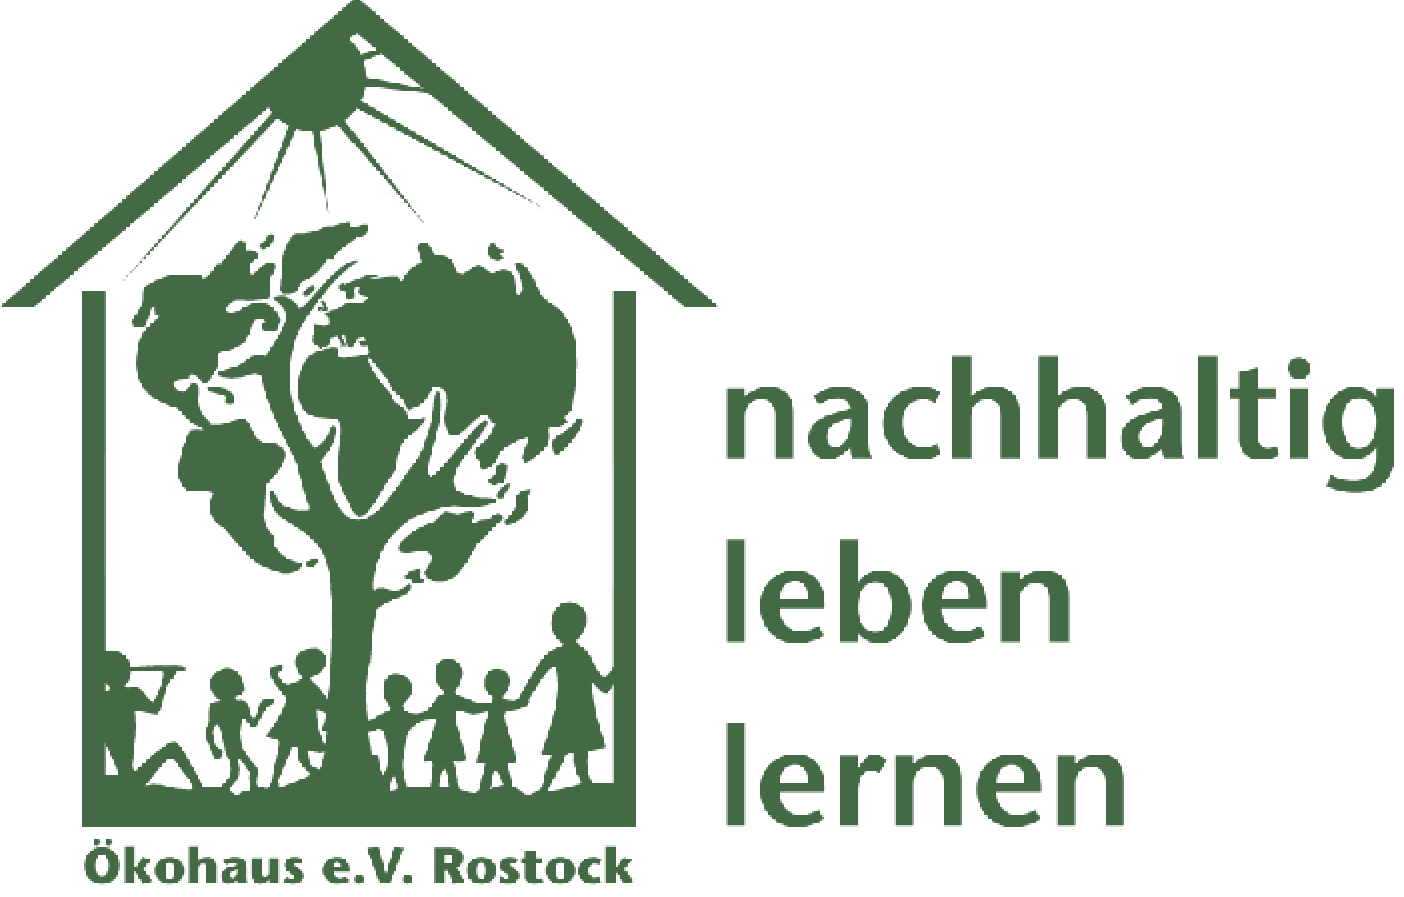 Oekohaus_logo